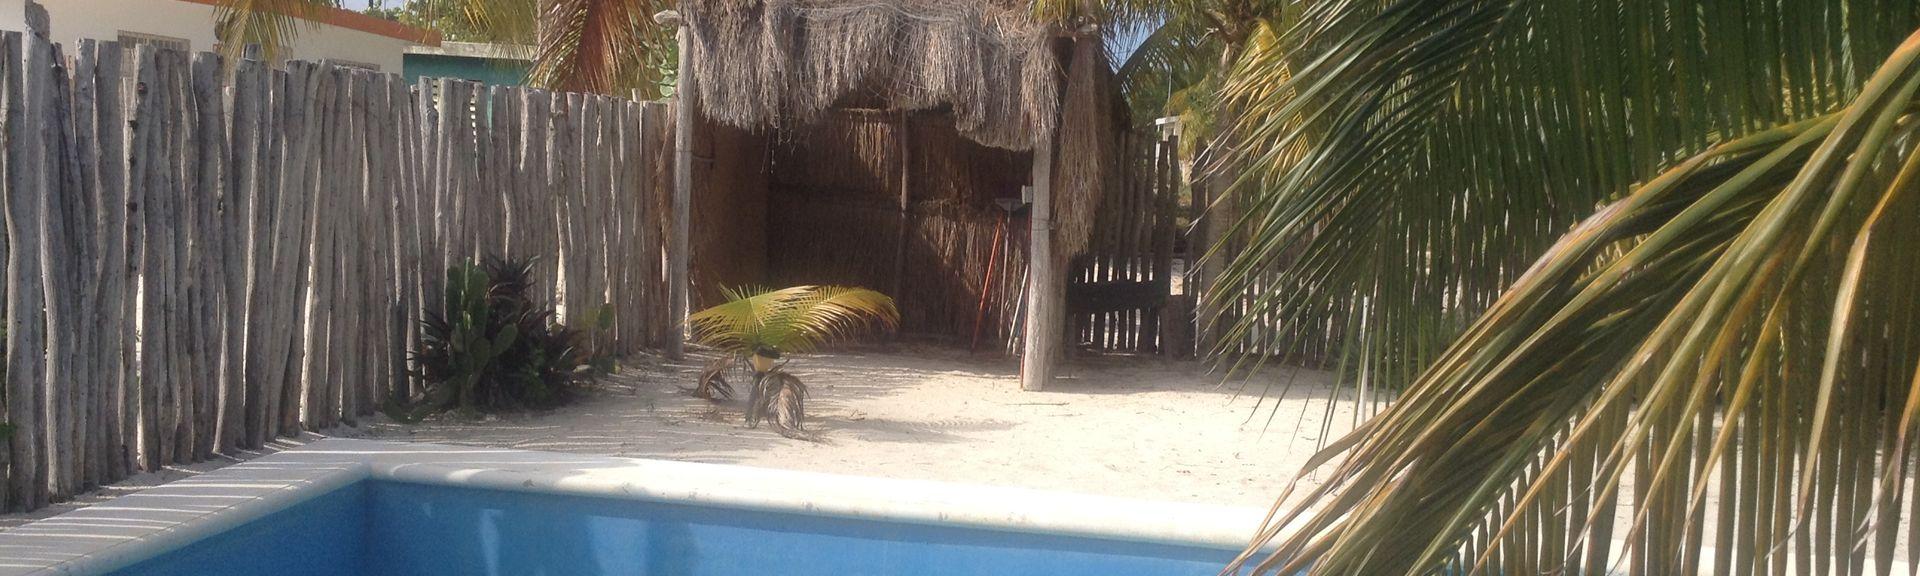 Progreso Municipality, Yucatan, Mexico